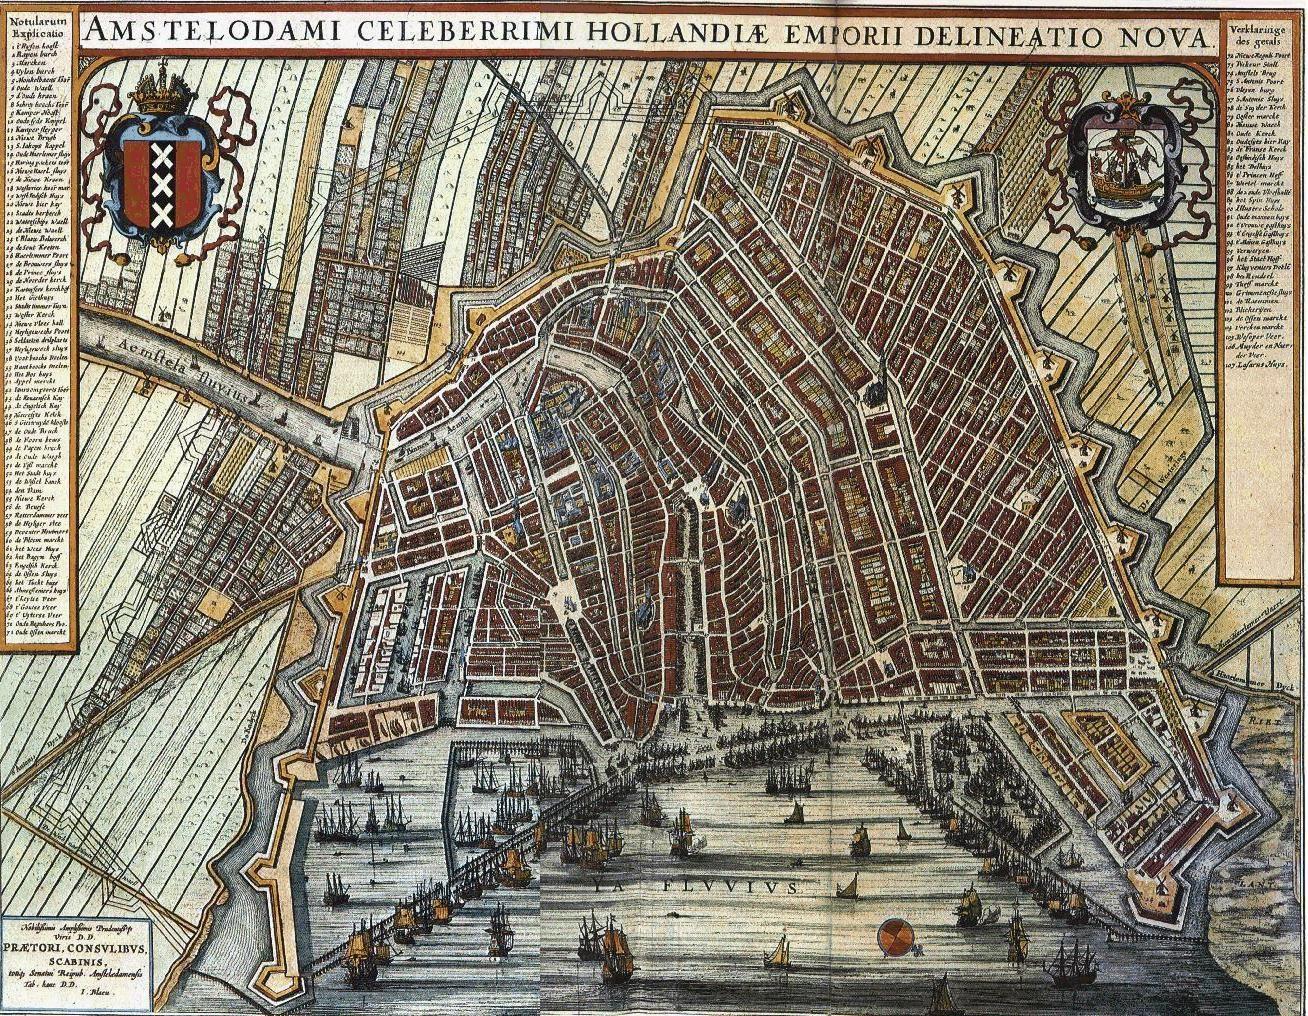 Httpodurletrugnlmapsimagesblaeuamsterdamjpg Travel - Amsterdam old map